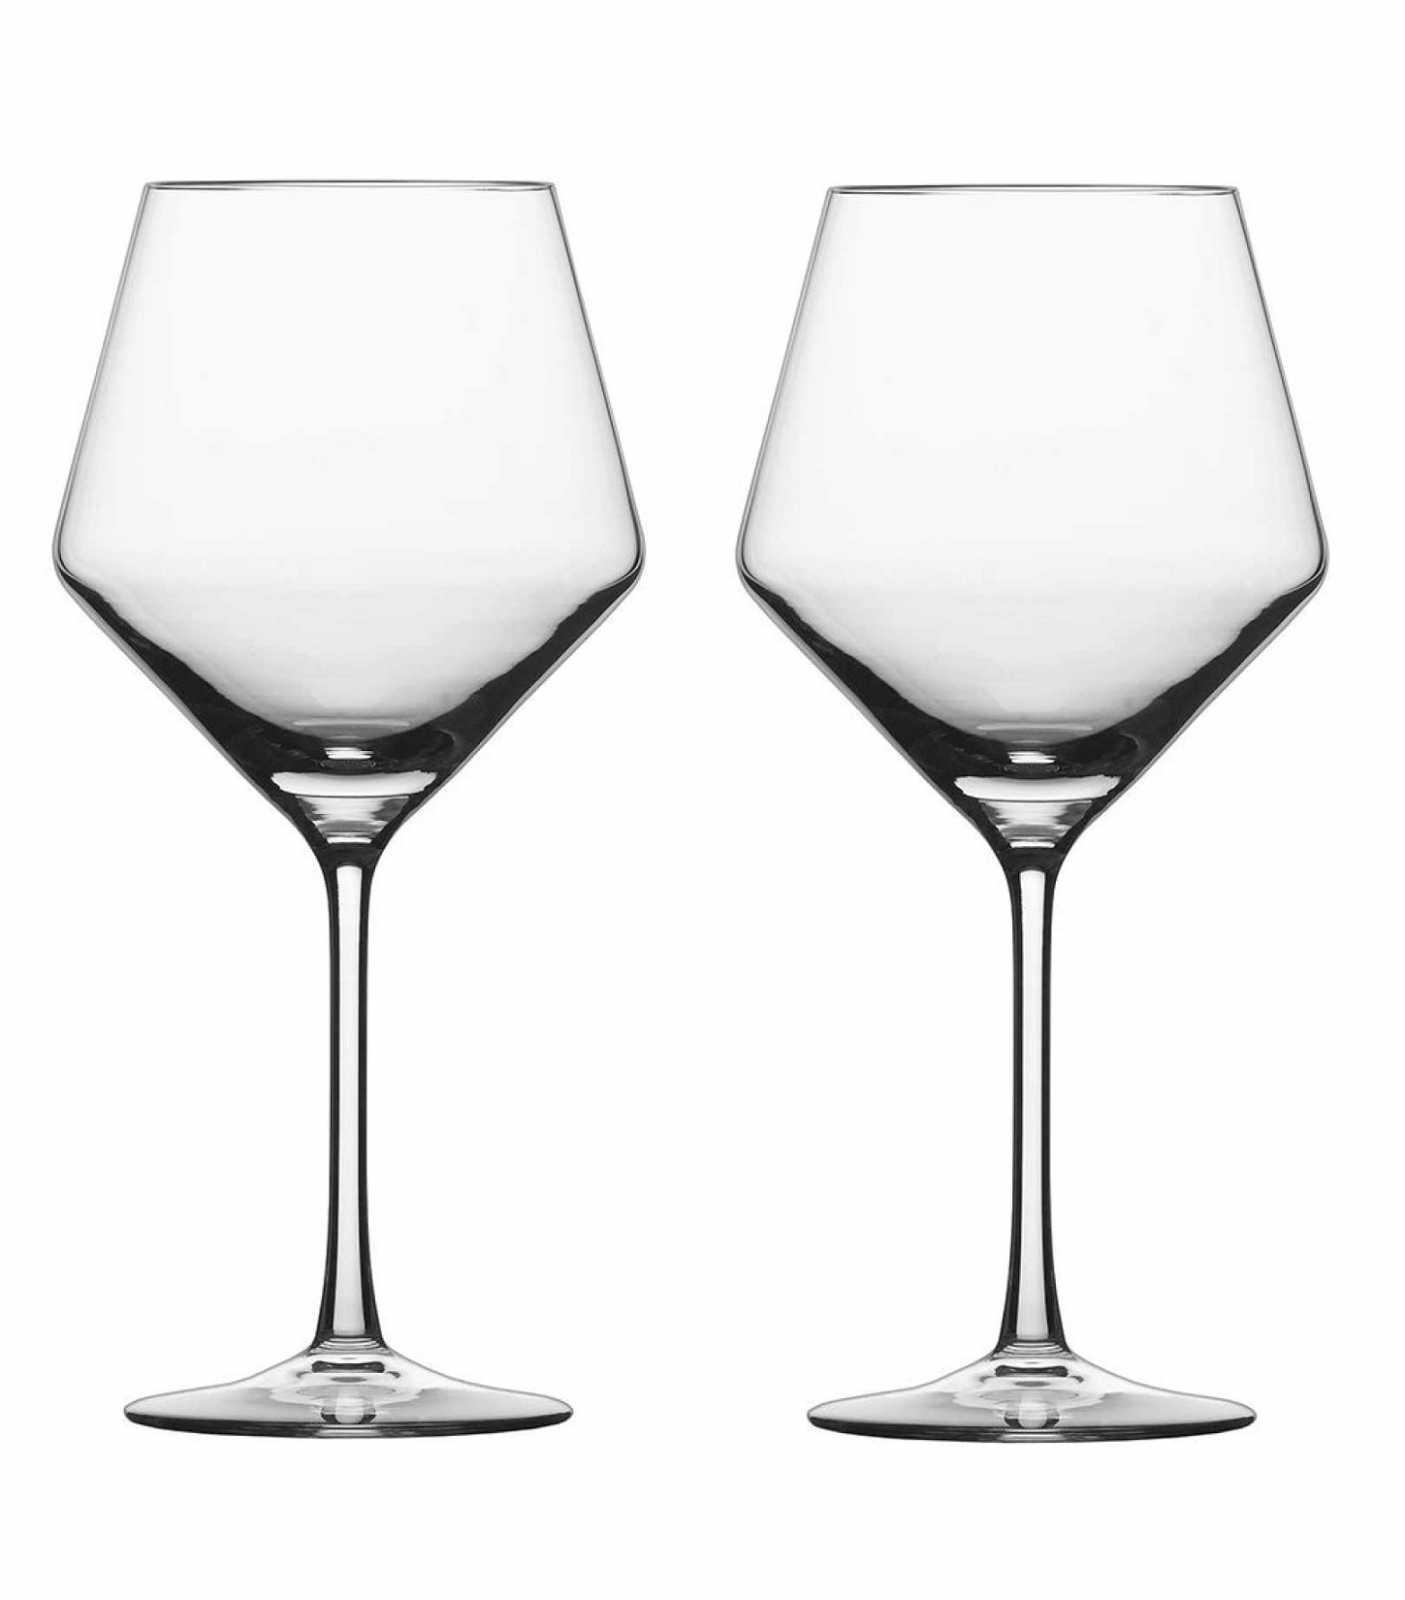 Набор бокалов для красного вина Schott Zwiesel PURE, прозрачный, 2 штуки Schott Zwiesel 112943_PROMO фото 0